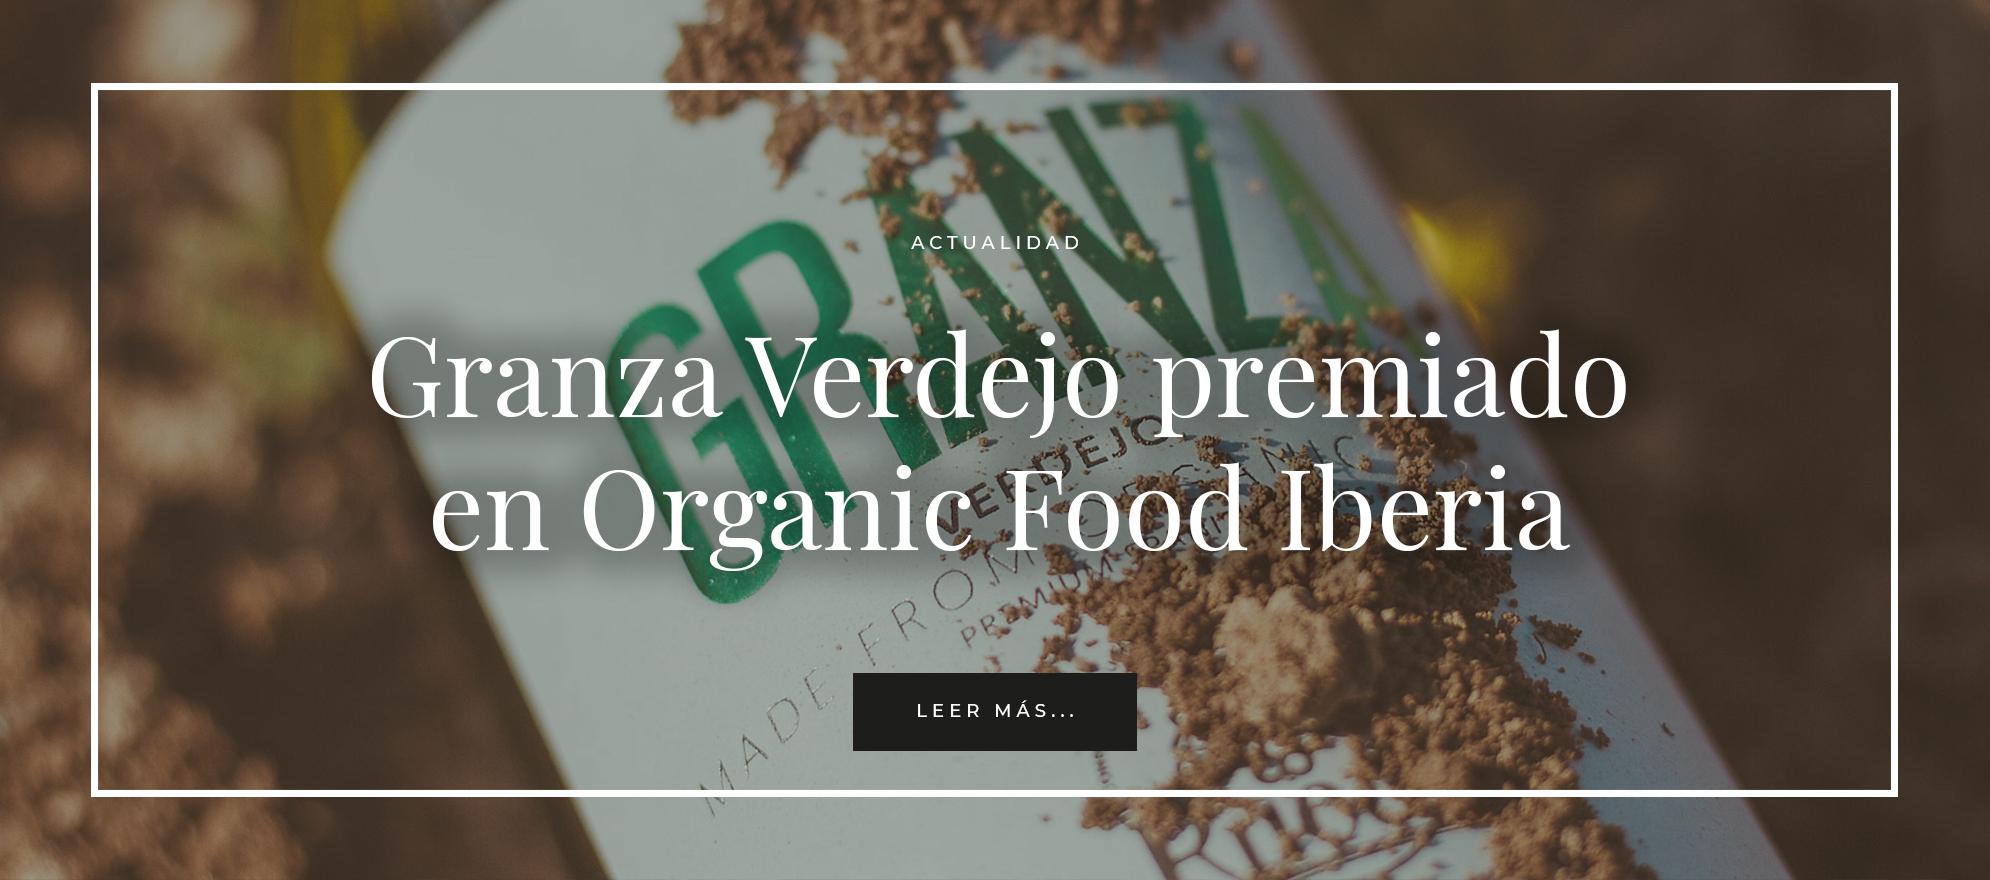 Granza Verdejo Organic food Iberia